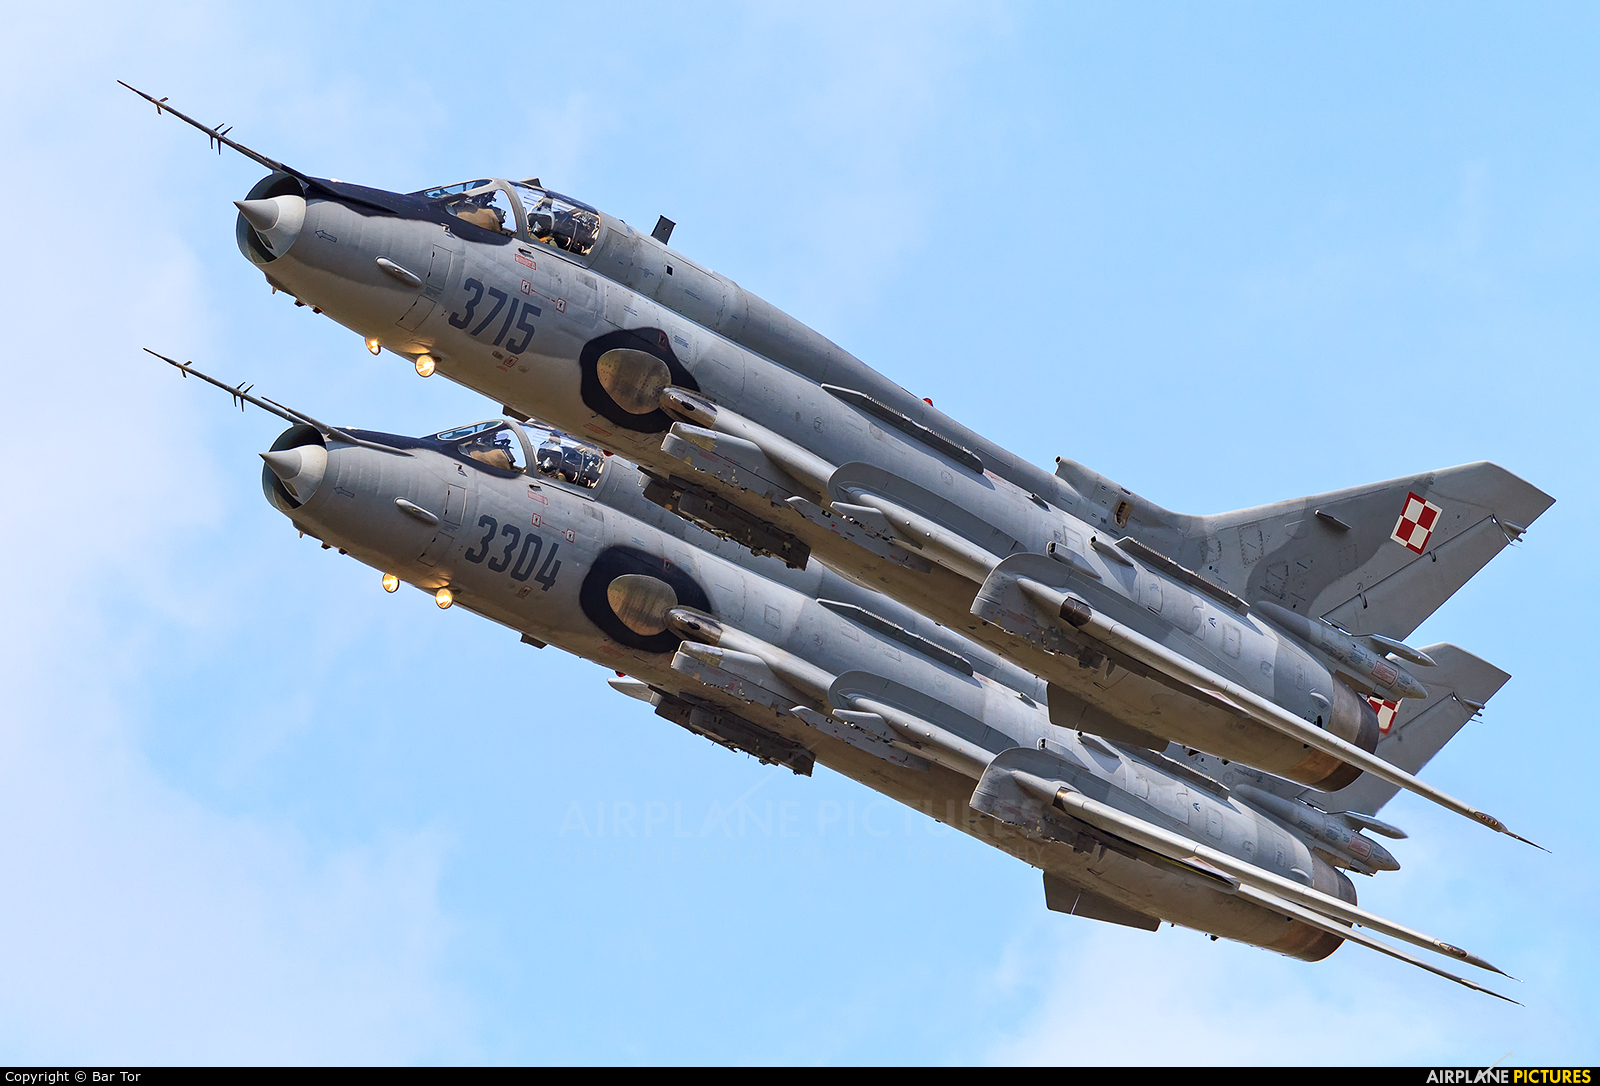 Poland - Air Force 3715 aircraft at Radom - Sadków